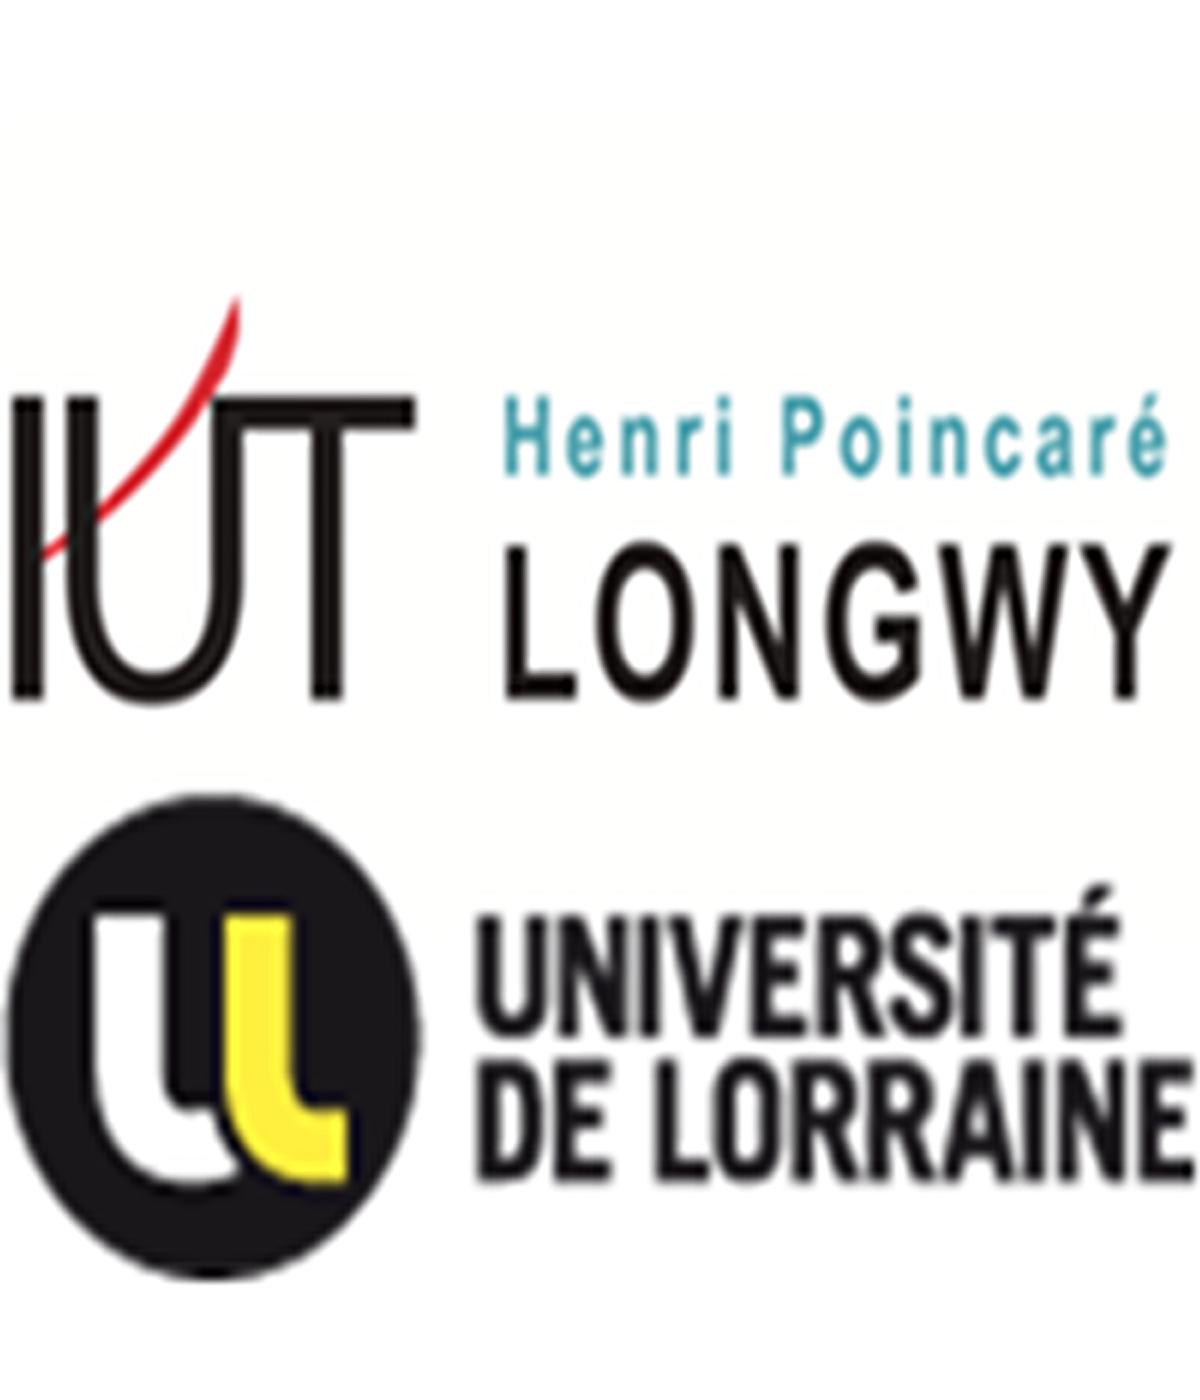 iut_longwy